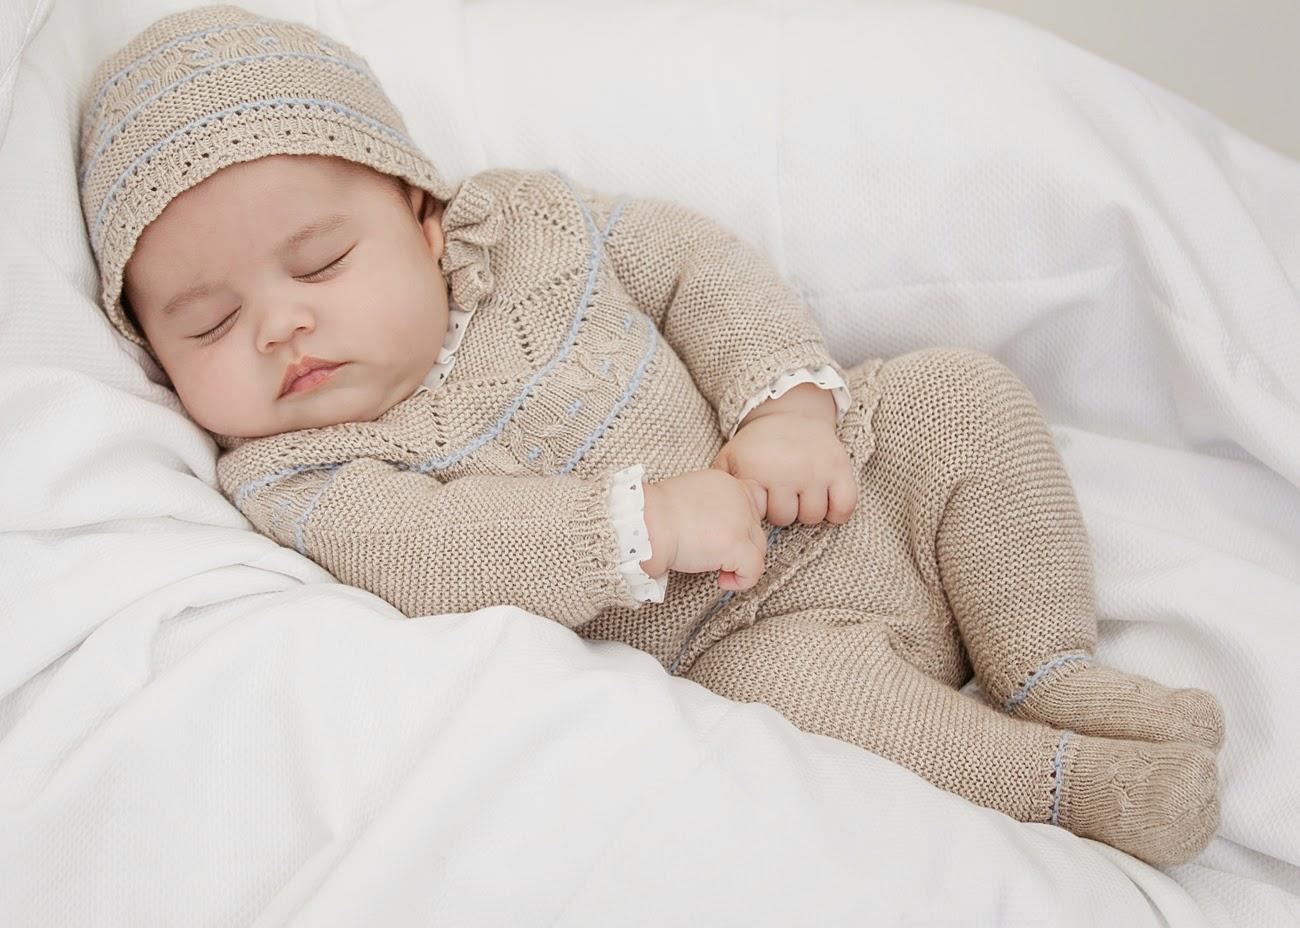 ebd6274af paranenesynenas  Moda infantil otoño invierno 2014-15 de Pili Carrera